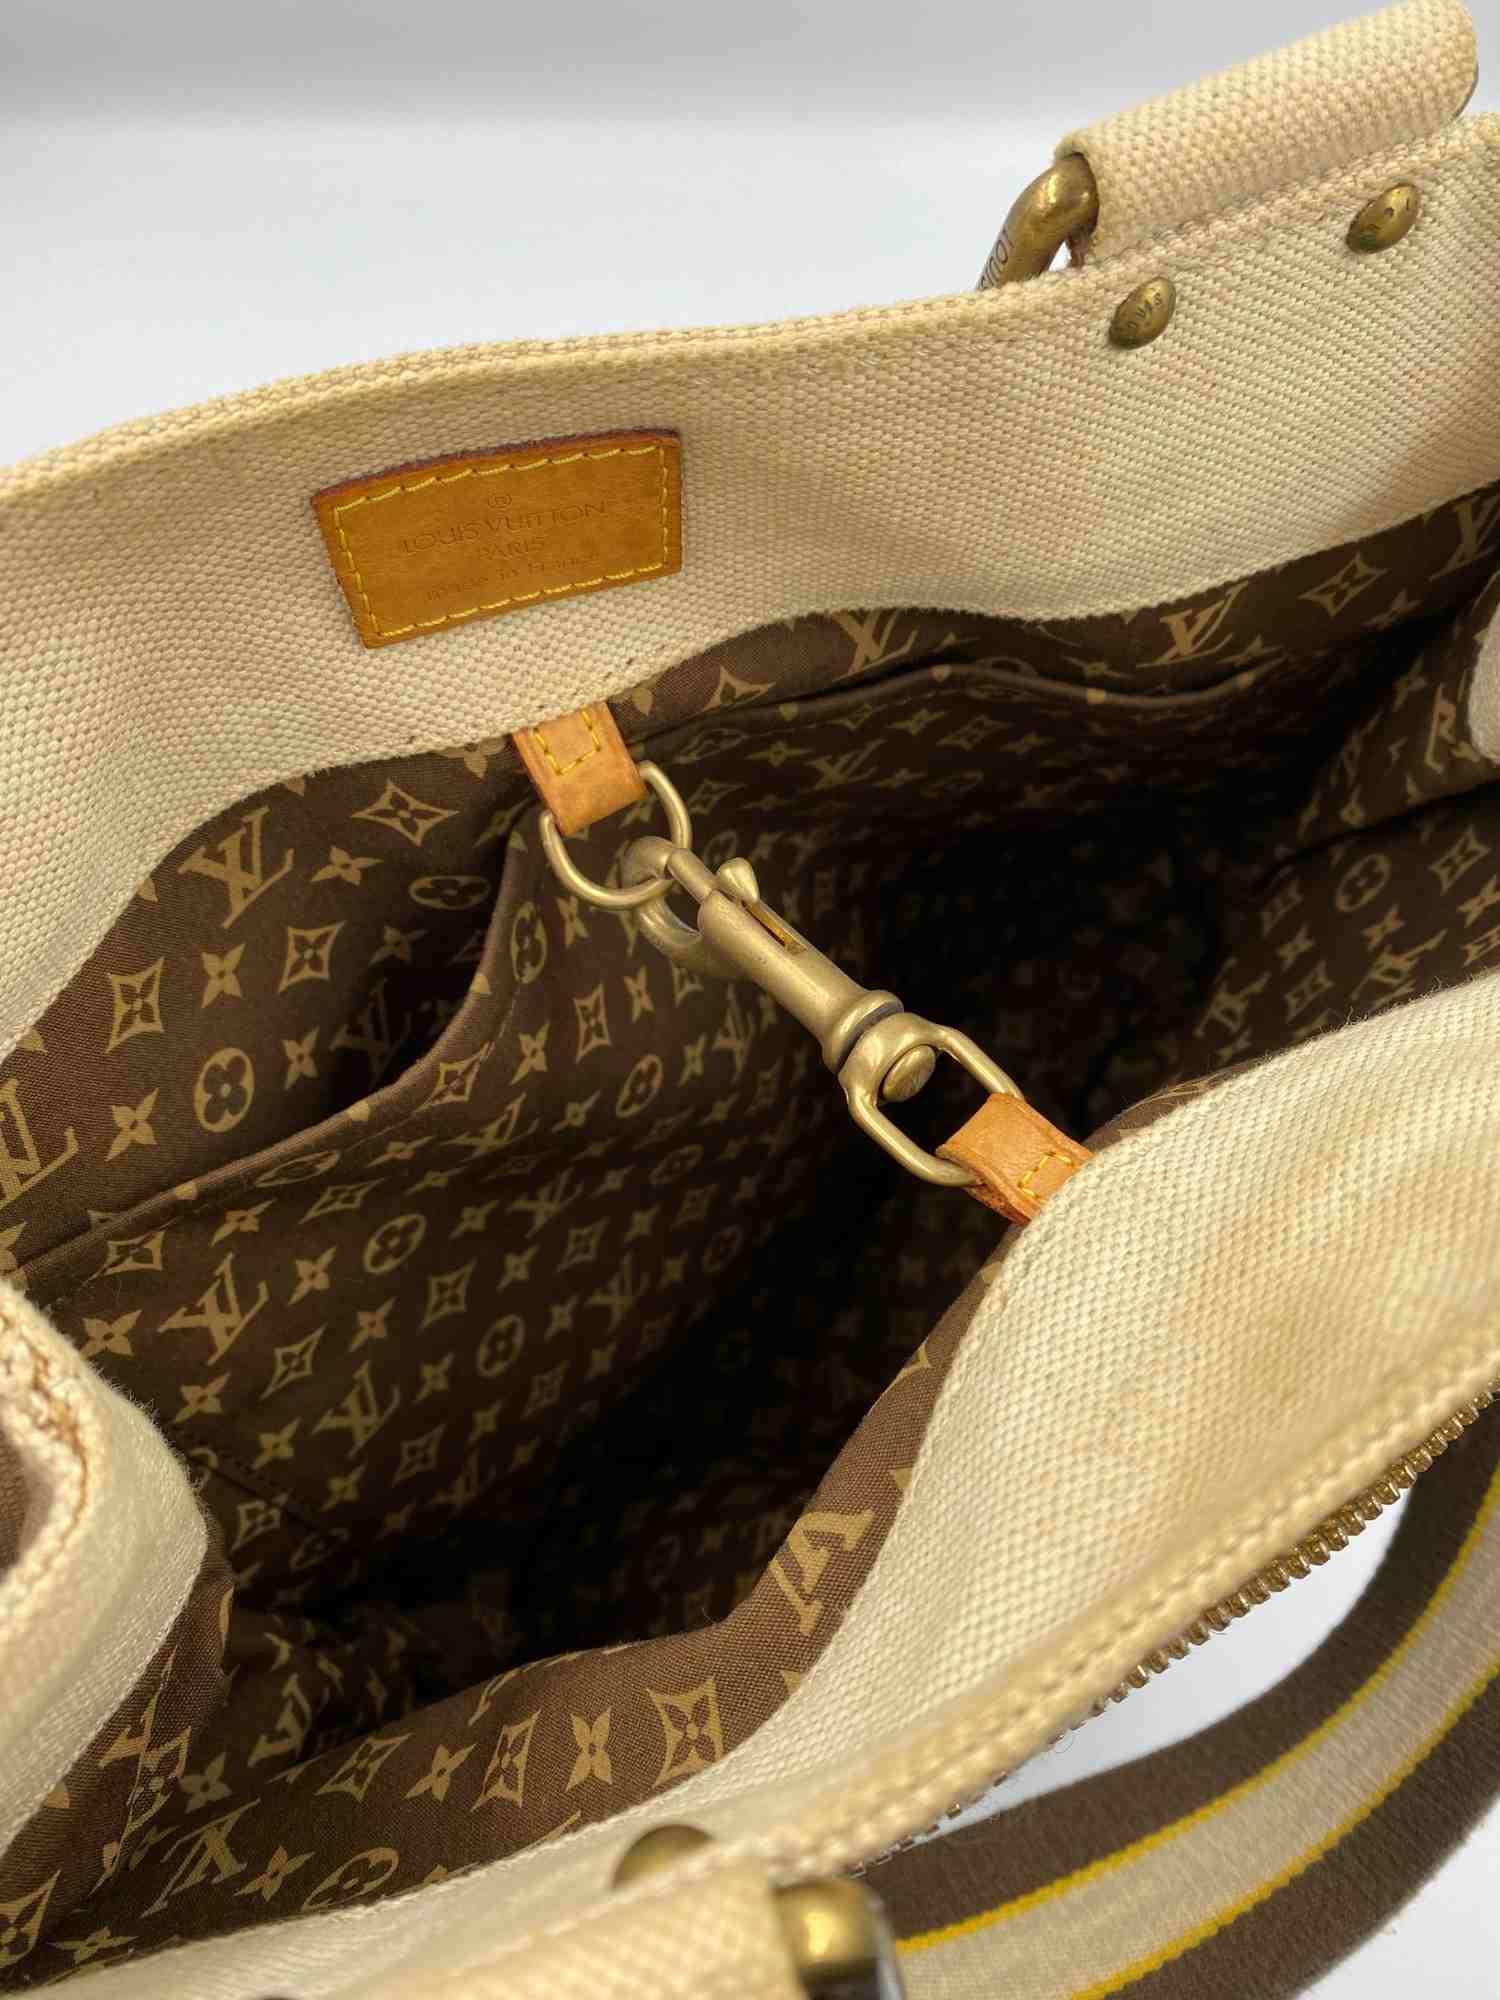 Bolsa Louis Vuitton Toile Globe Shopper Cabas